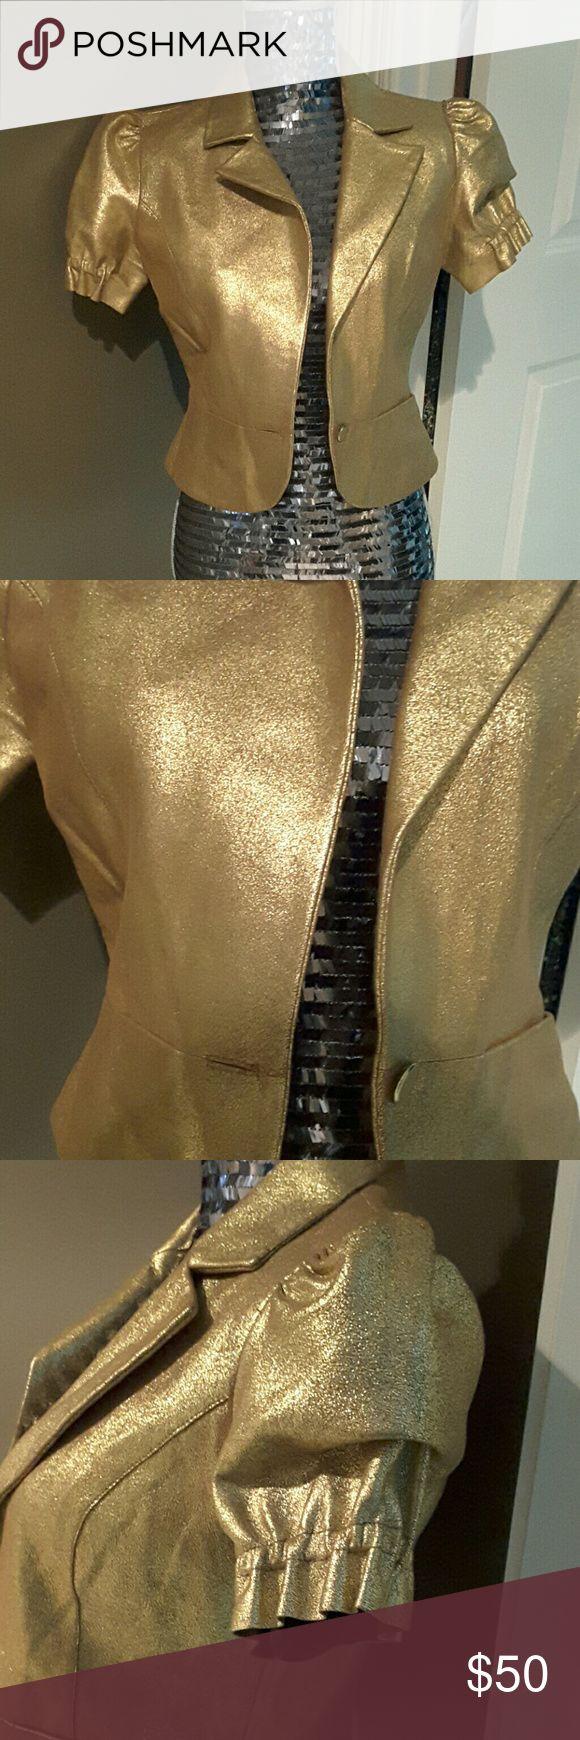 Golden Lambskin Leather Blazer 100% lambskin leather jacket blazer with short sleeves and 2 stylish pockets Heart Moon Stars Jackets & Coats Blazers